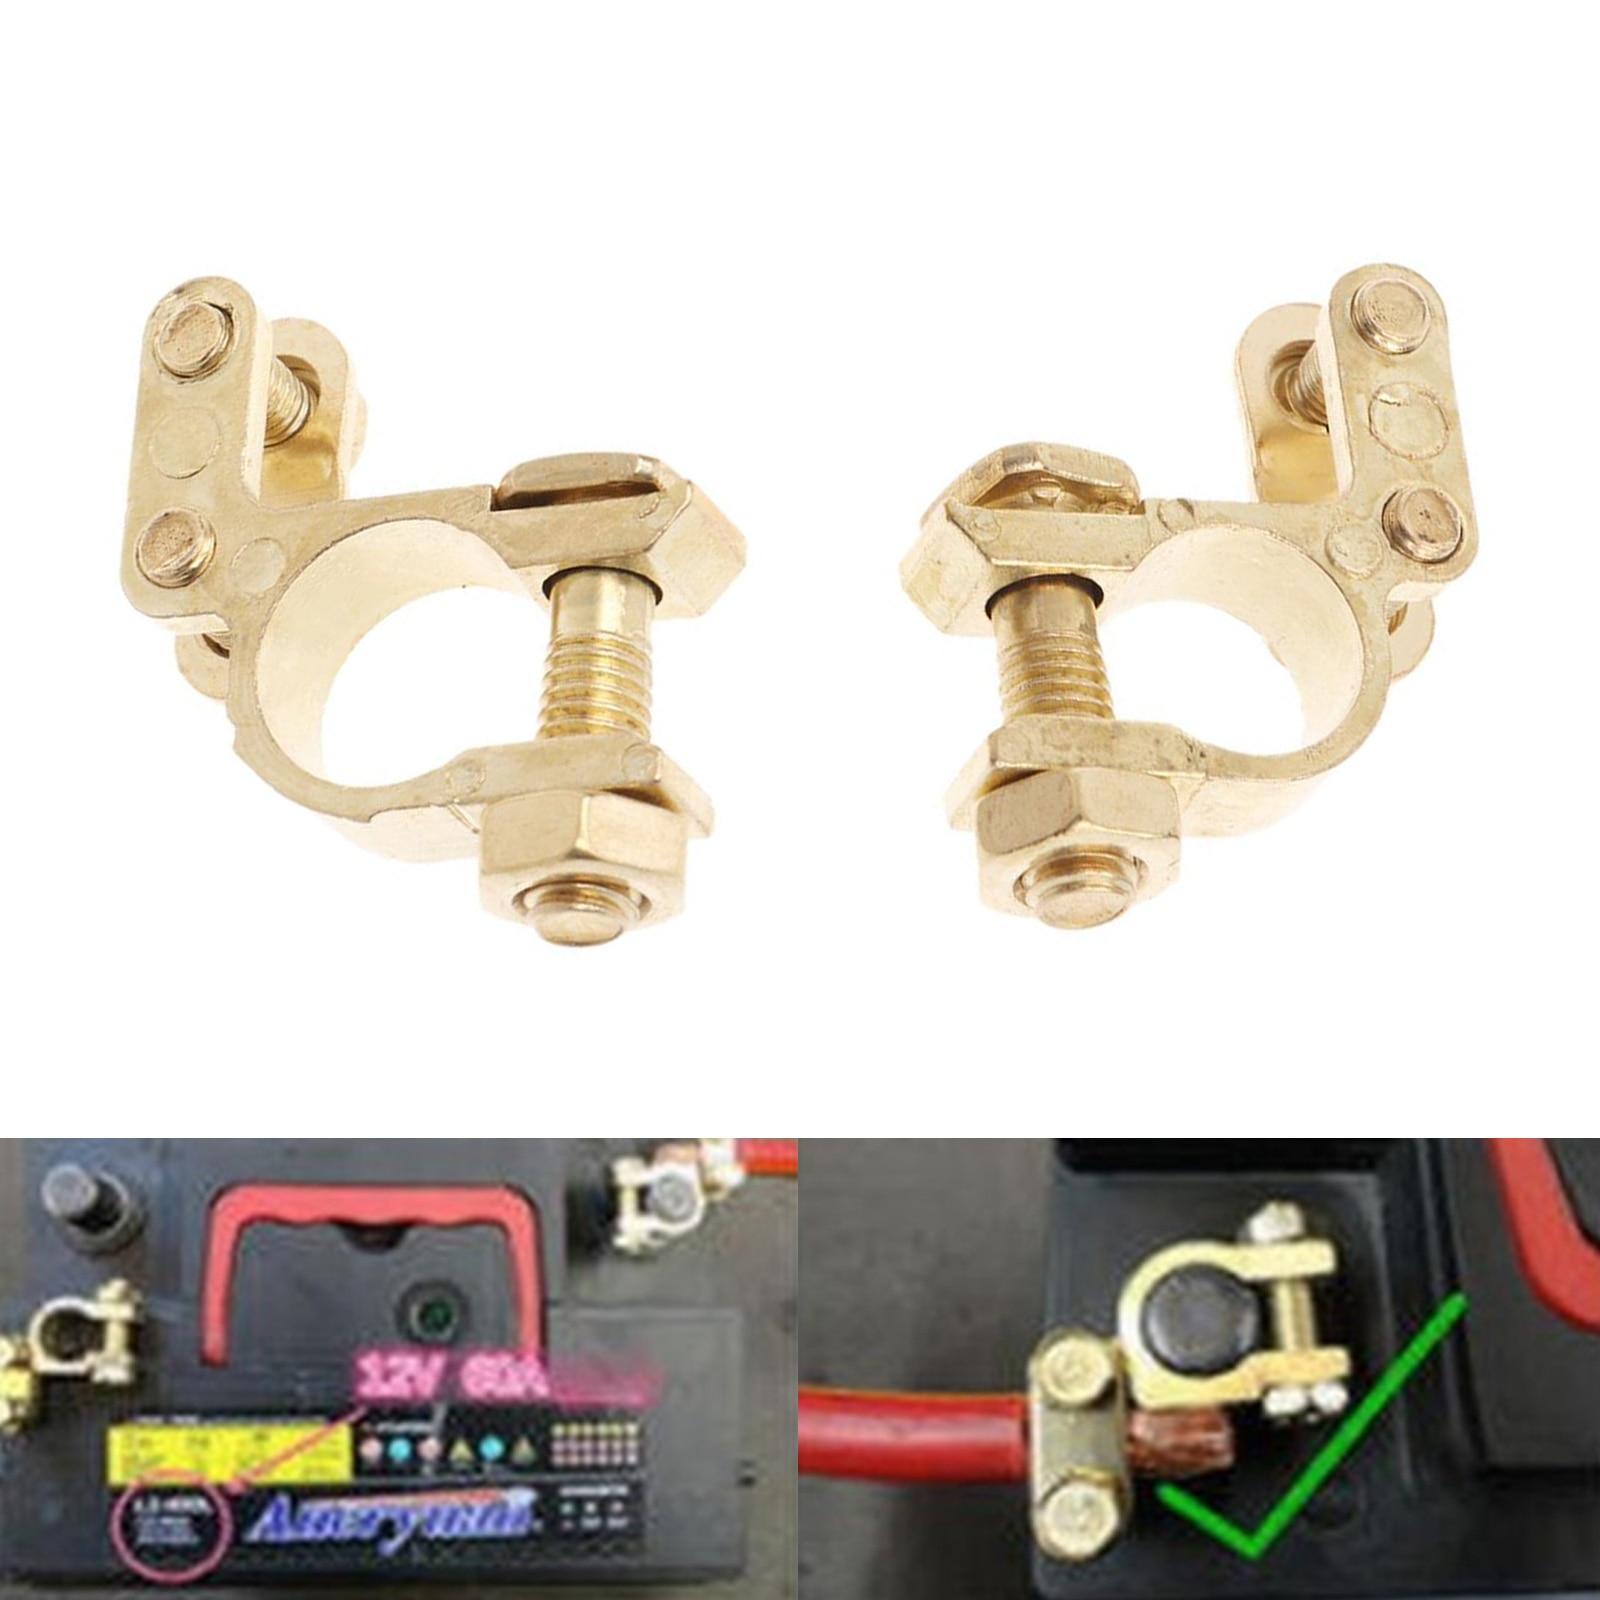 2pcs Small Size 35mm Car Battery Terminals Clamps Pair Screw Connection Positive&Negative Brass Cables Connectors Accessories